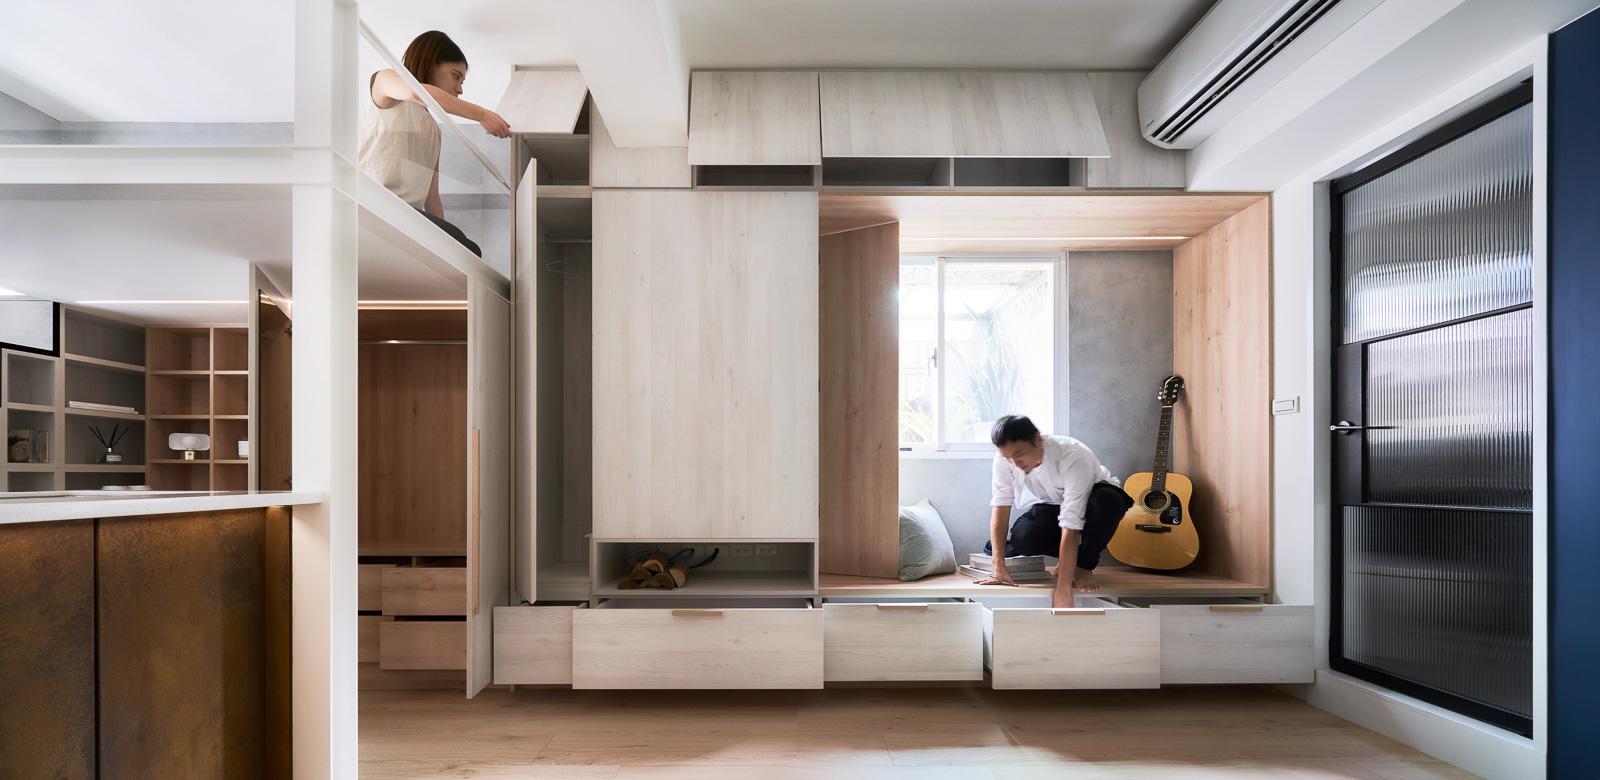 NestSpace_SmallHouse_S-084